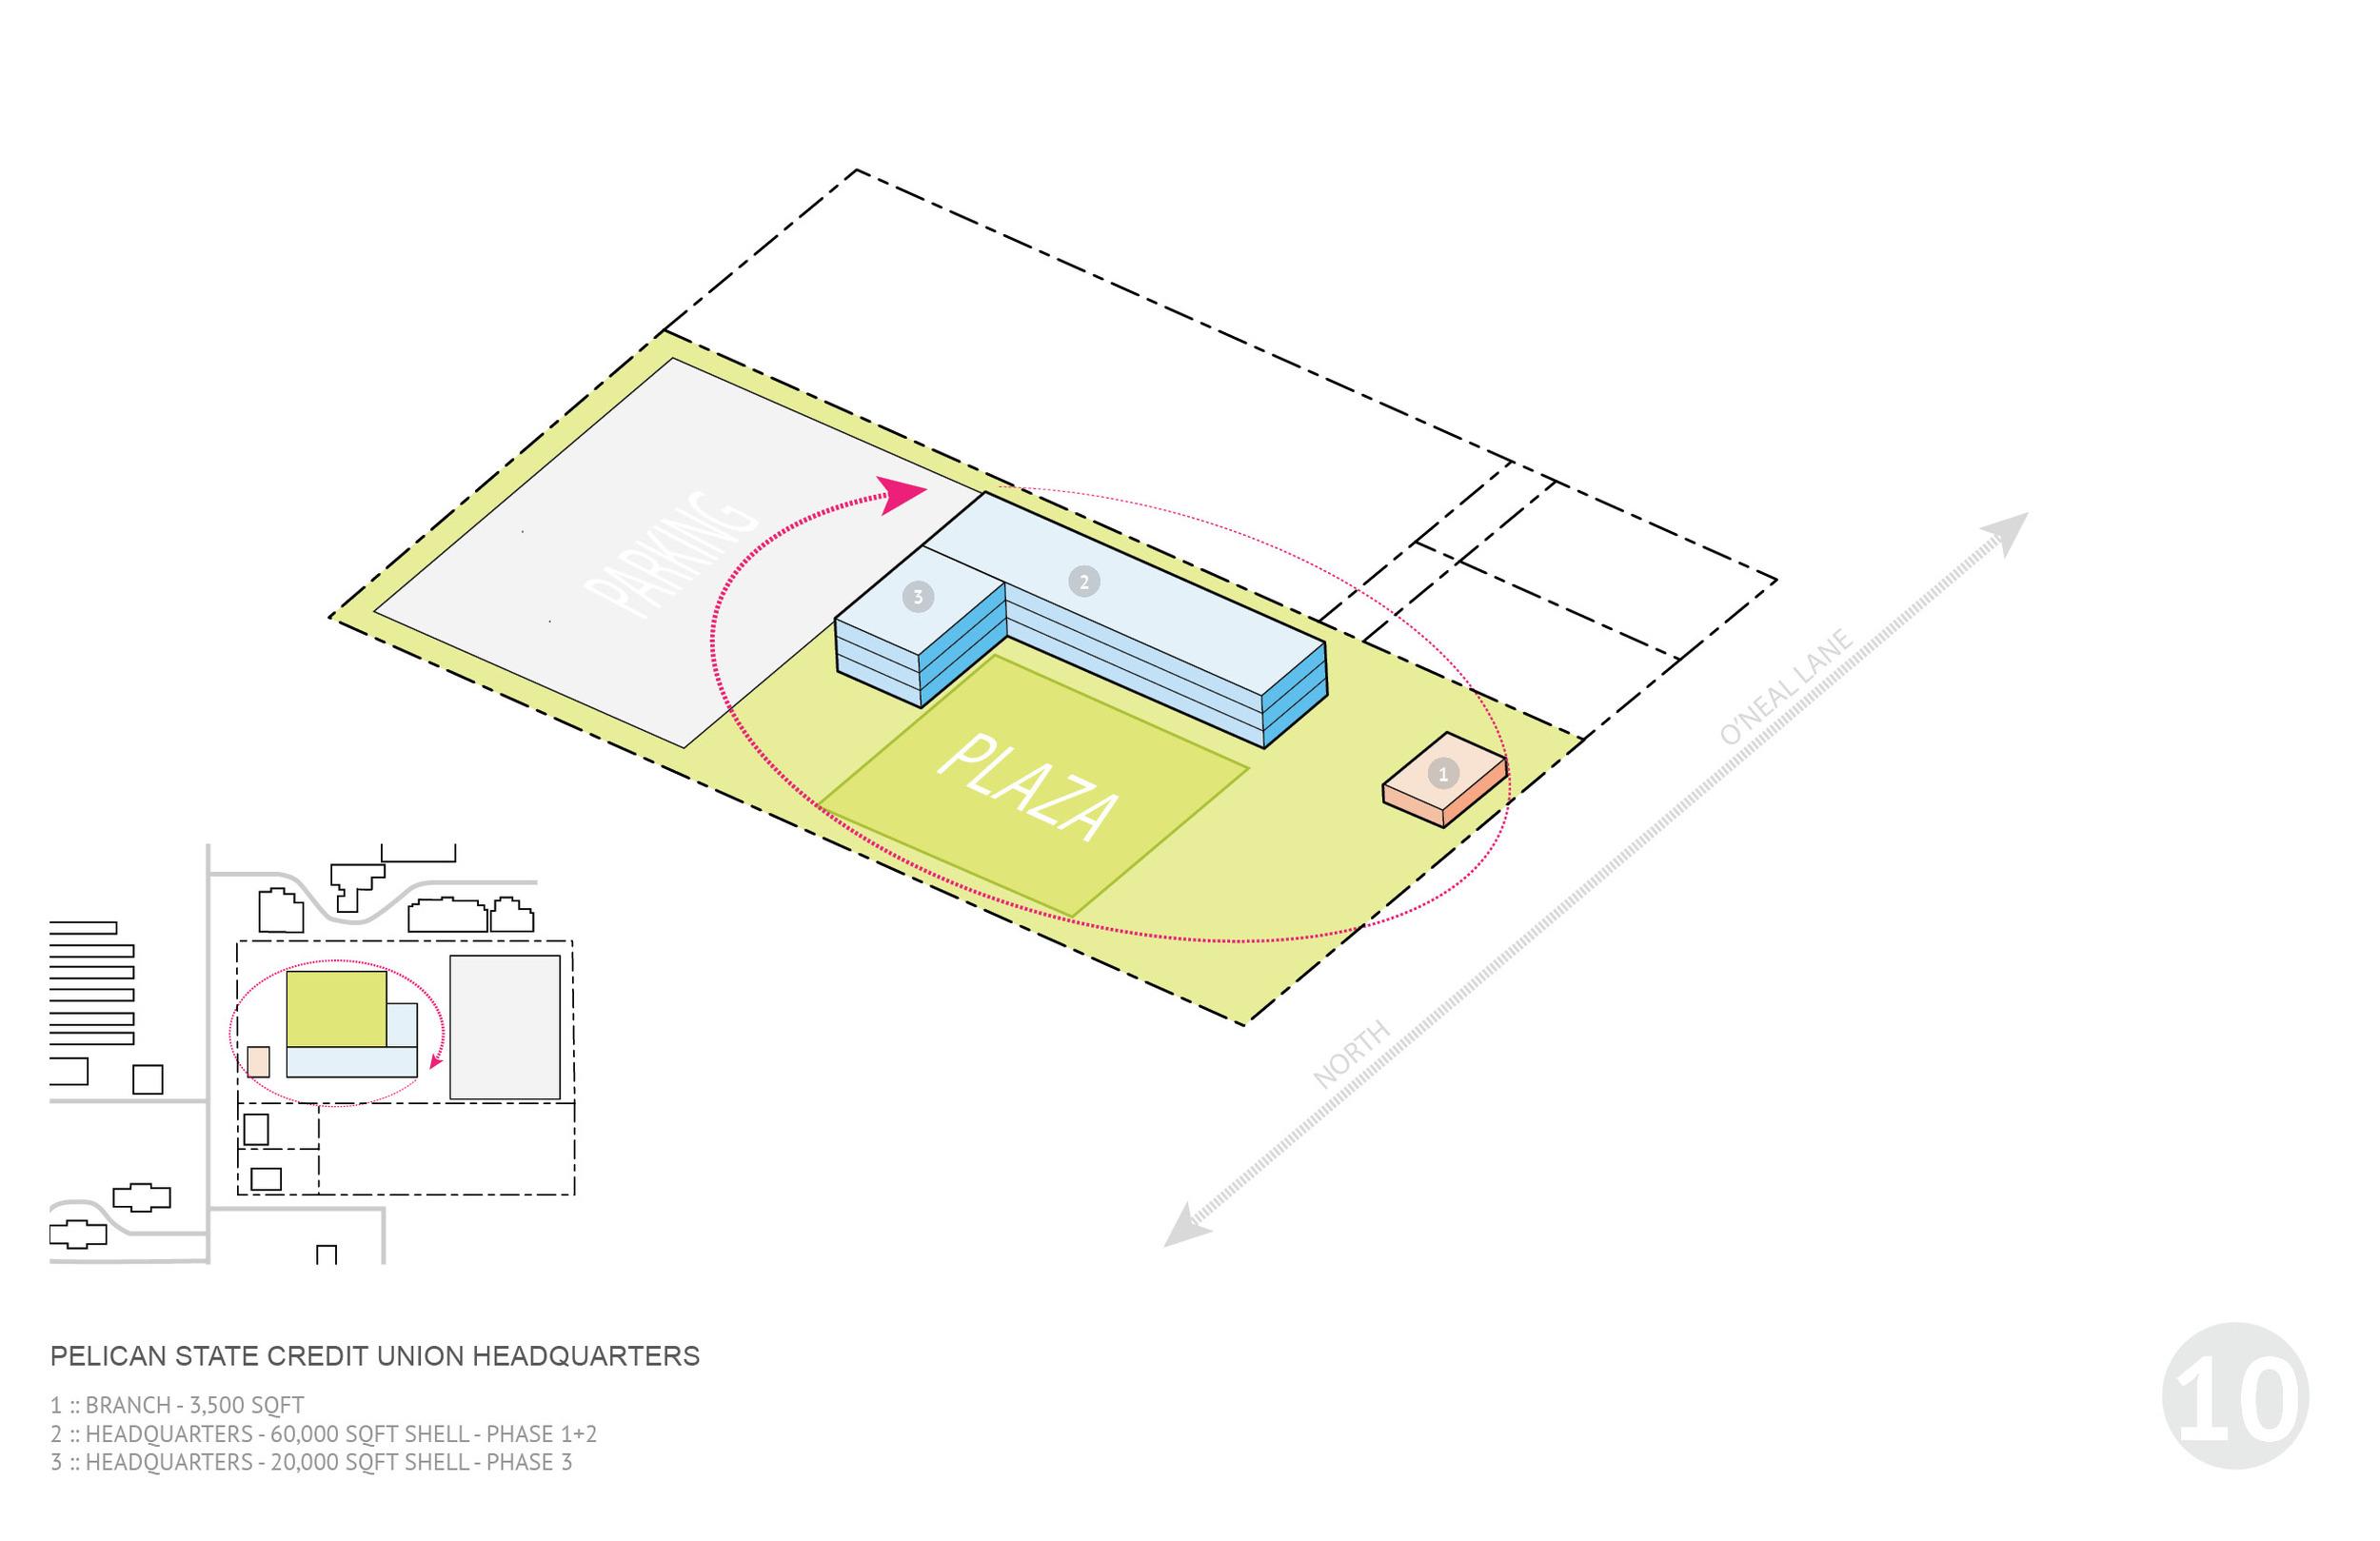 A_SlideshowDiagram_10.jpg